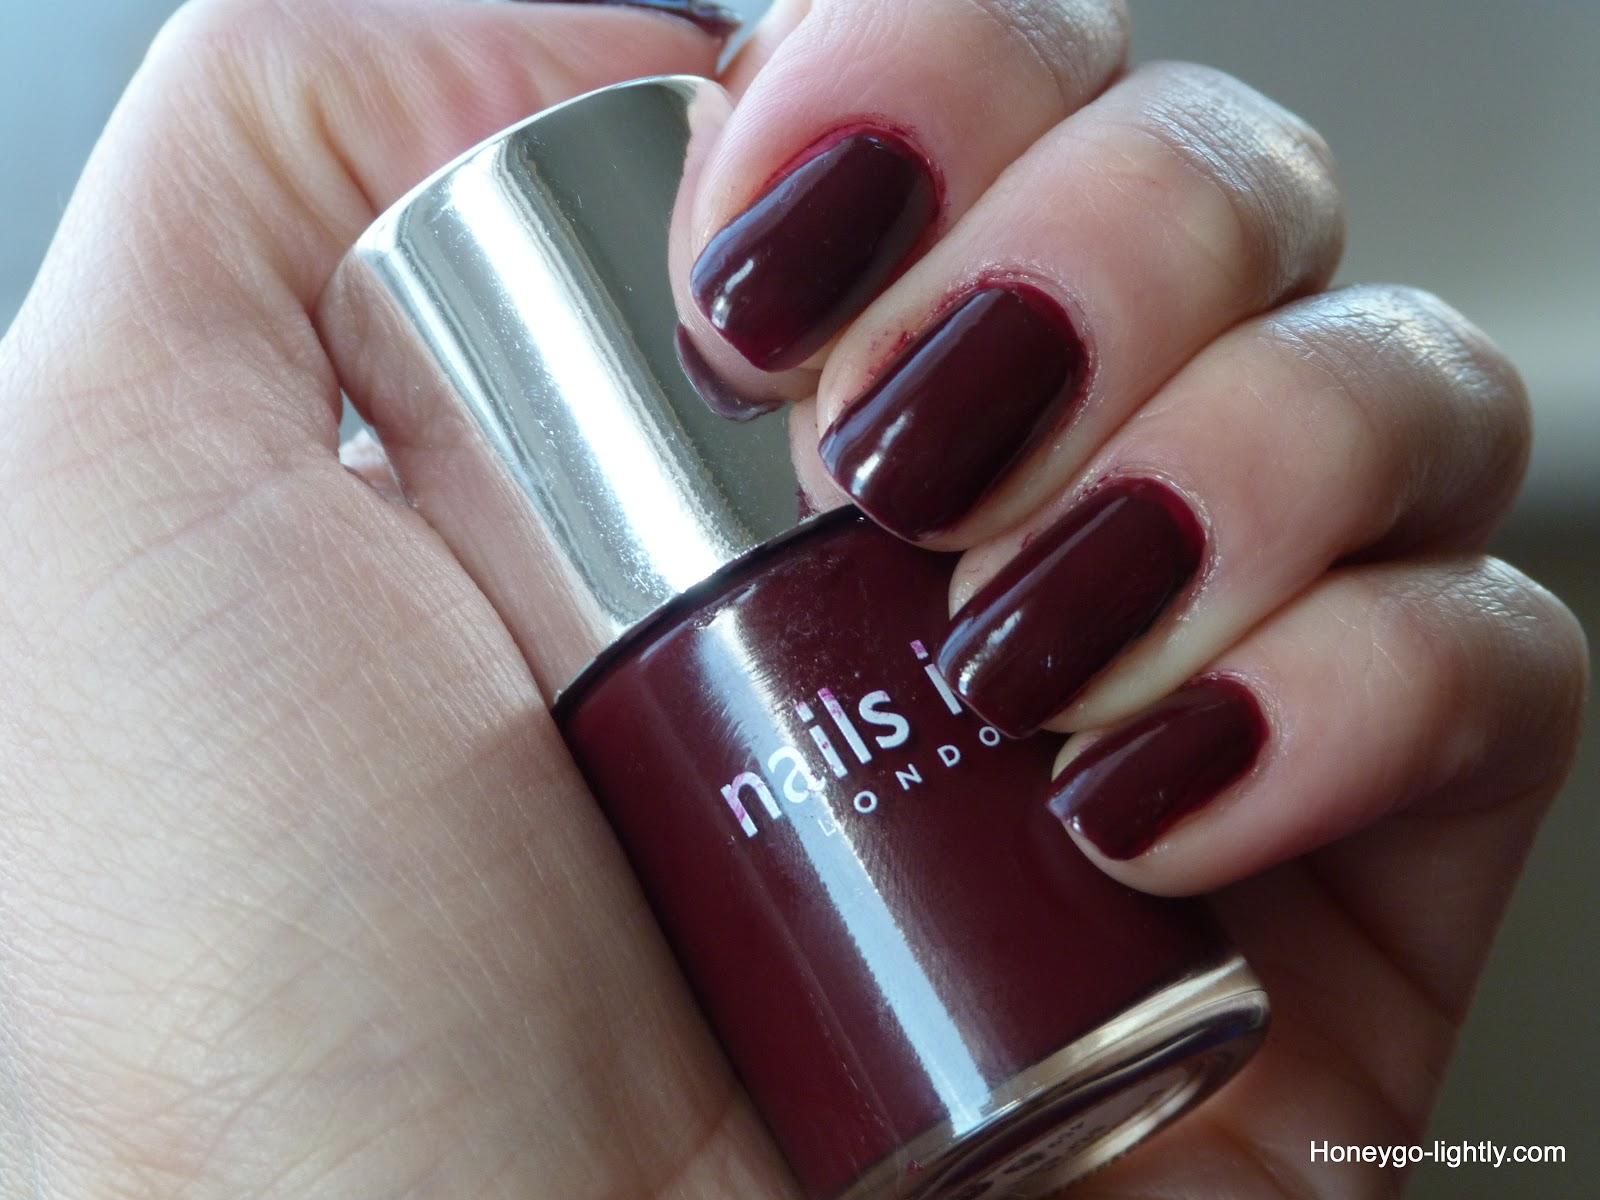 Nails Inc Paddington Street - Honey Go-Lightly